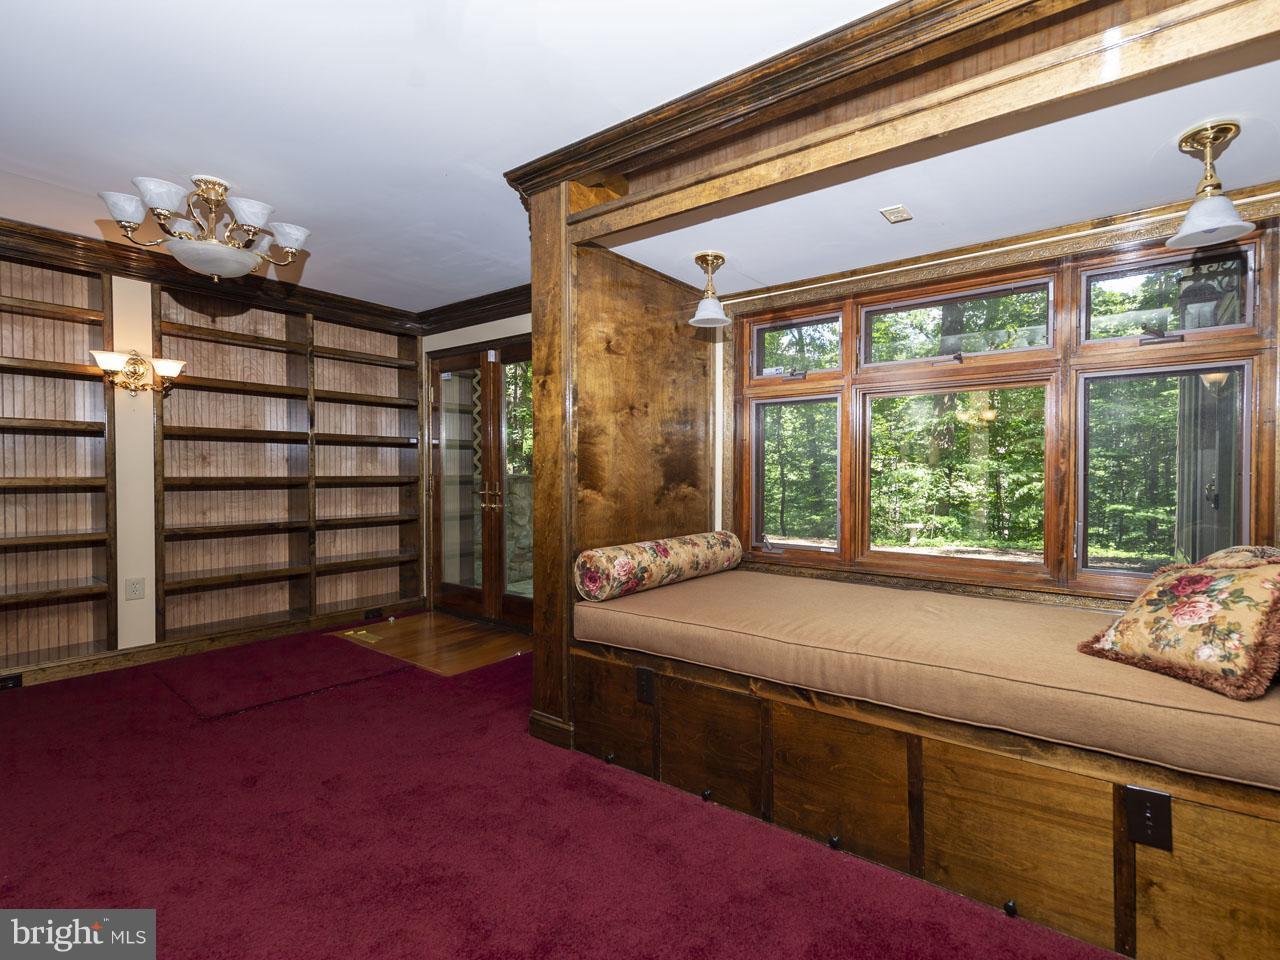 1002303700-300502417946-2021-07-22-03-27-23  |   | Alexandria Delaware Real Estate For Sale | MLS# 1002303700  - Best of Northern Virginia